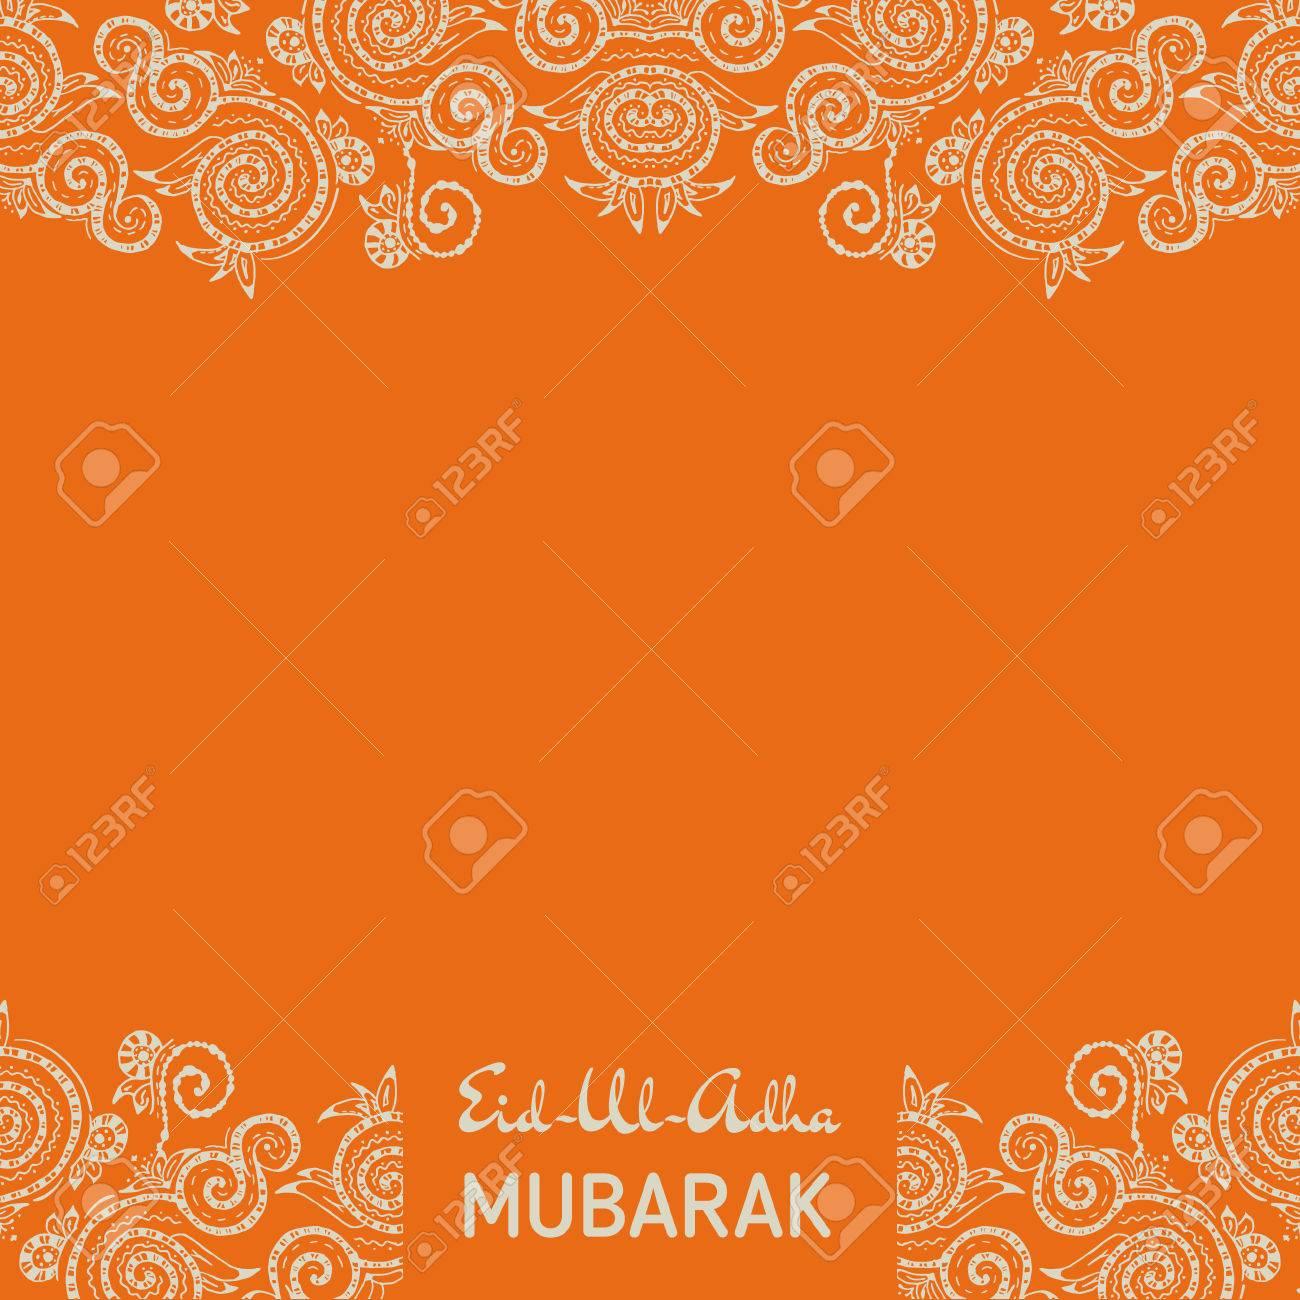 Amazing Hajj Eid Al-Fitr Decorations - 42088790-greeting-card-template-for-muslim-community-festival-eid-al-fitr-mubarak-with-zentangle-ornament-  Pic_96336 .jpg